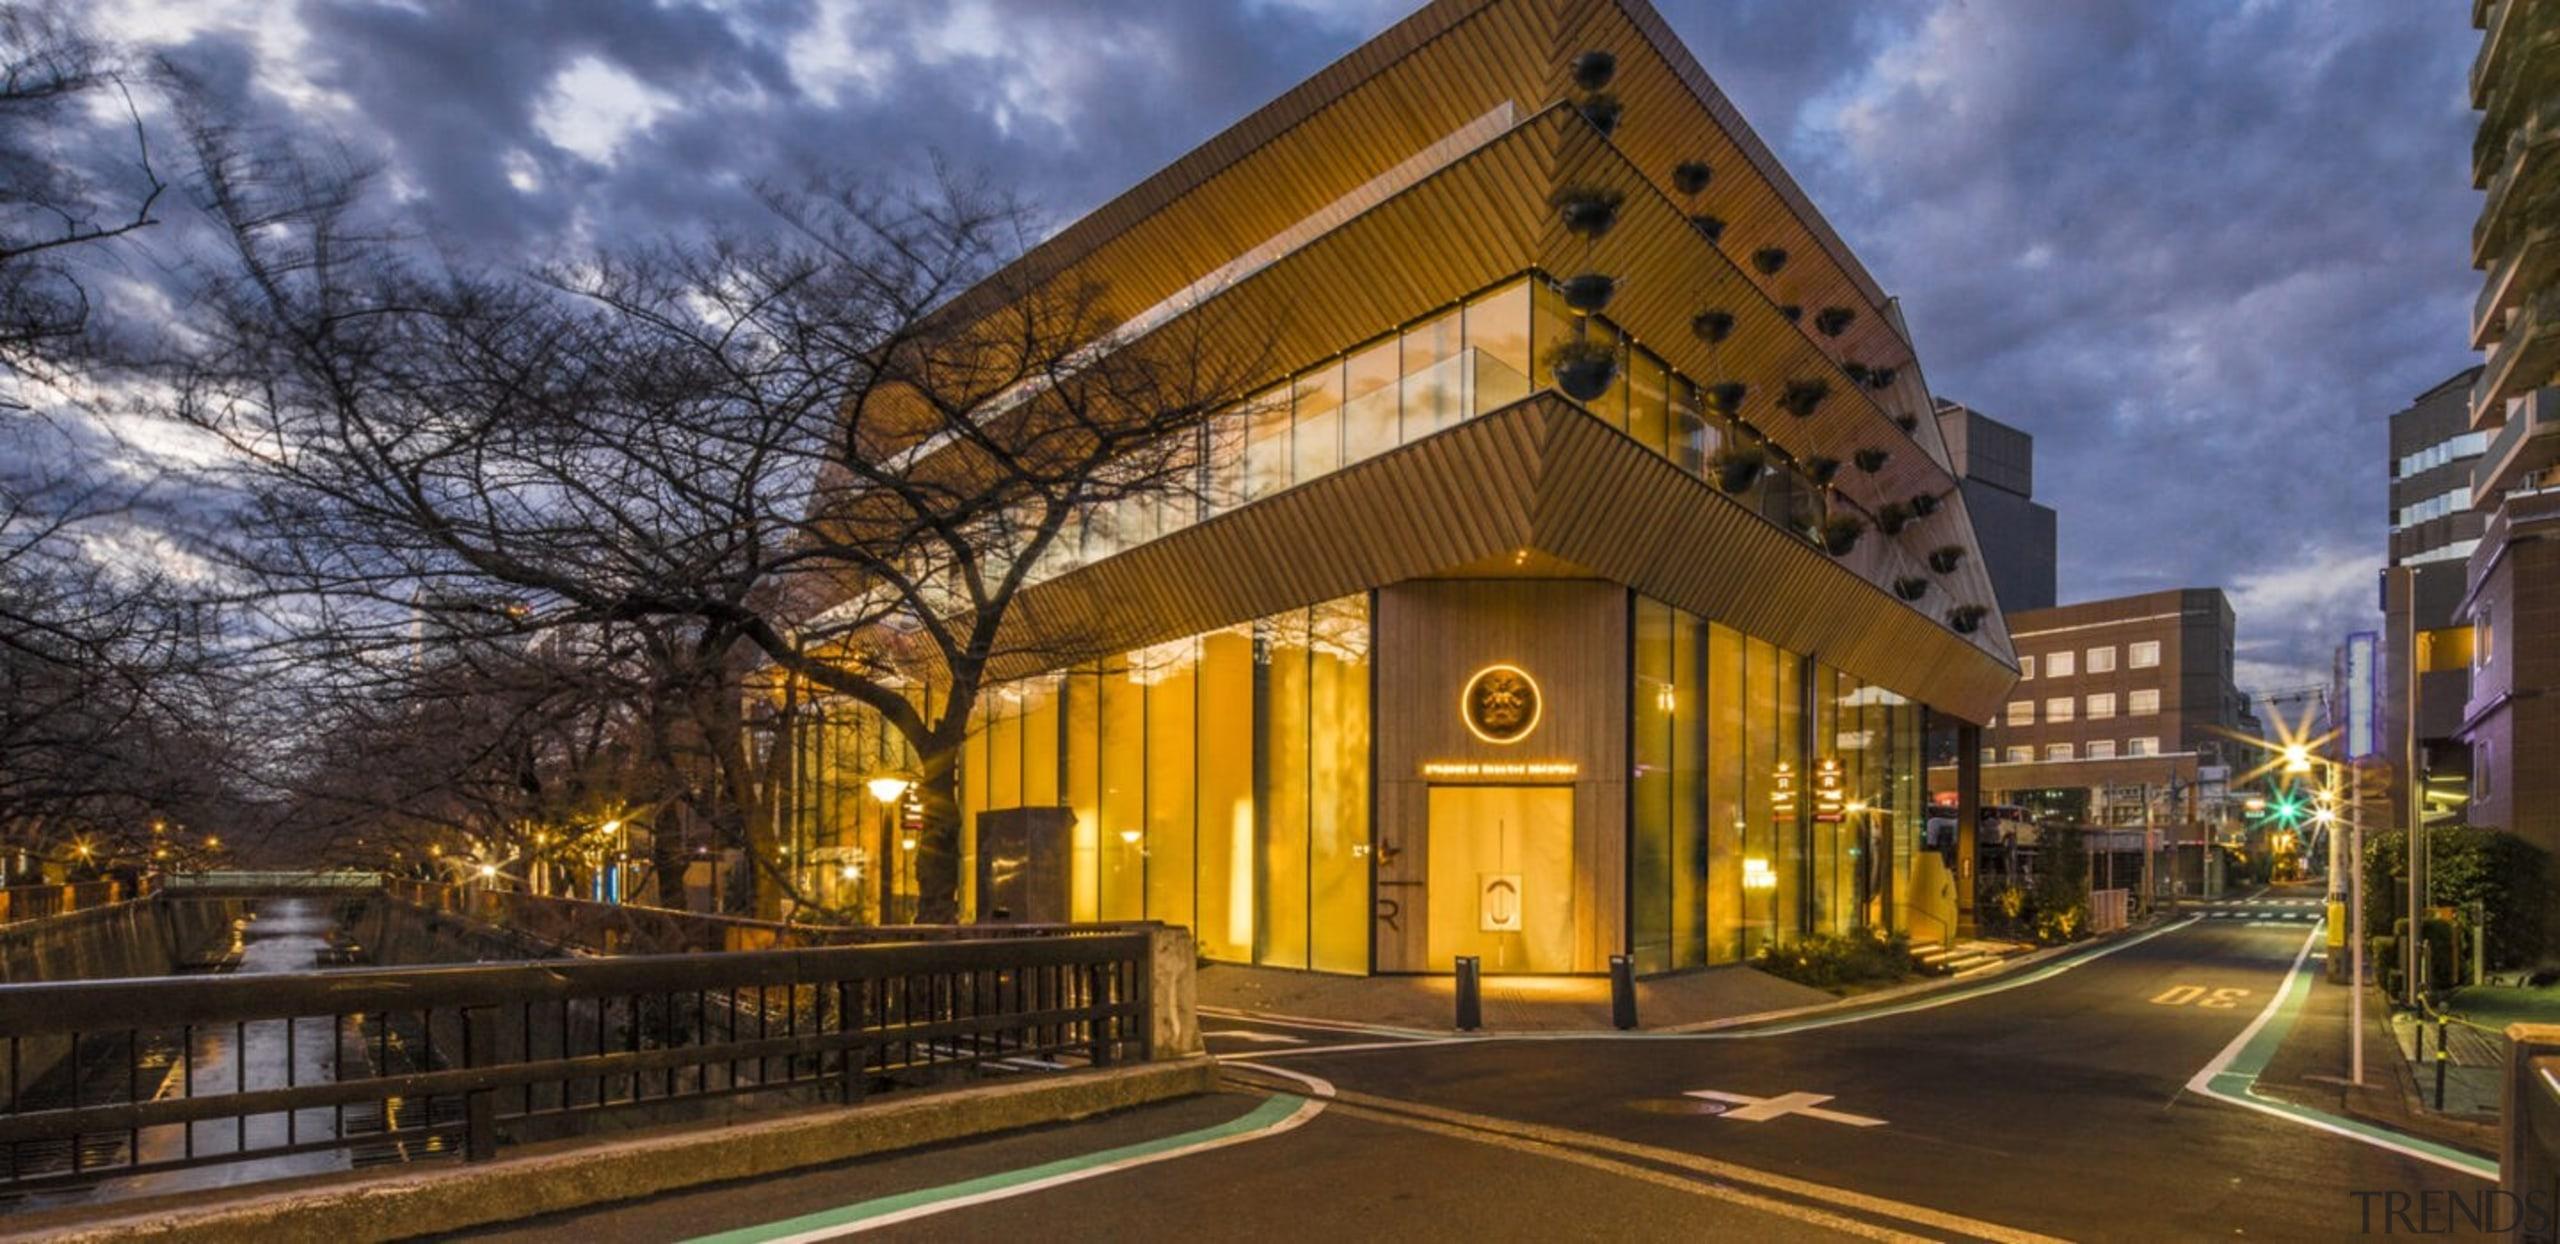 Tokyo Roastery Exterior Horiz 1 1440X700 - arch arch, architecture, building, commercial building, estate, facade, home, house, metropolitan area, mixed-use, night, property, real estate, residential area, brown